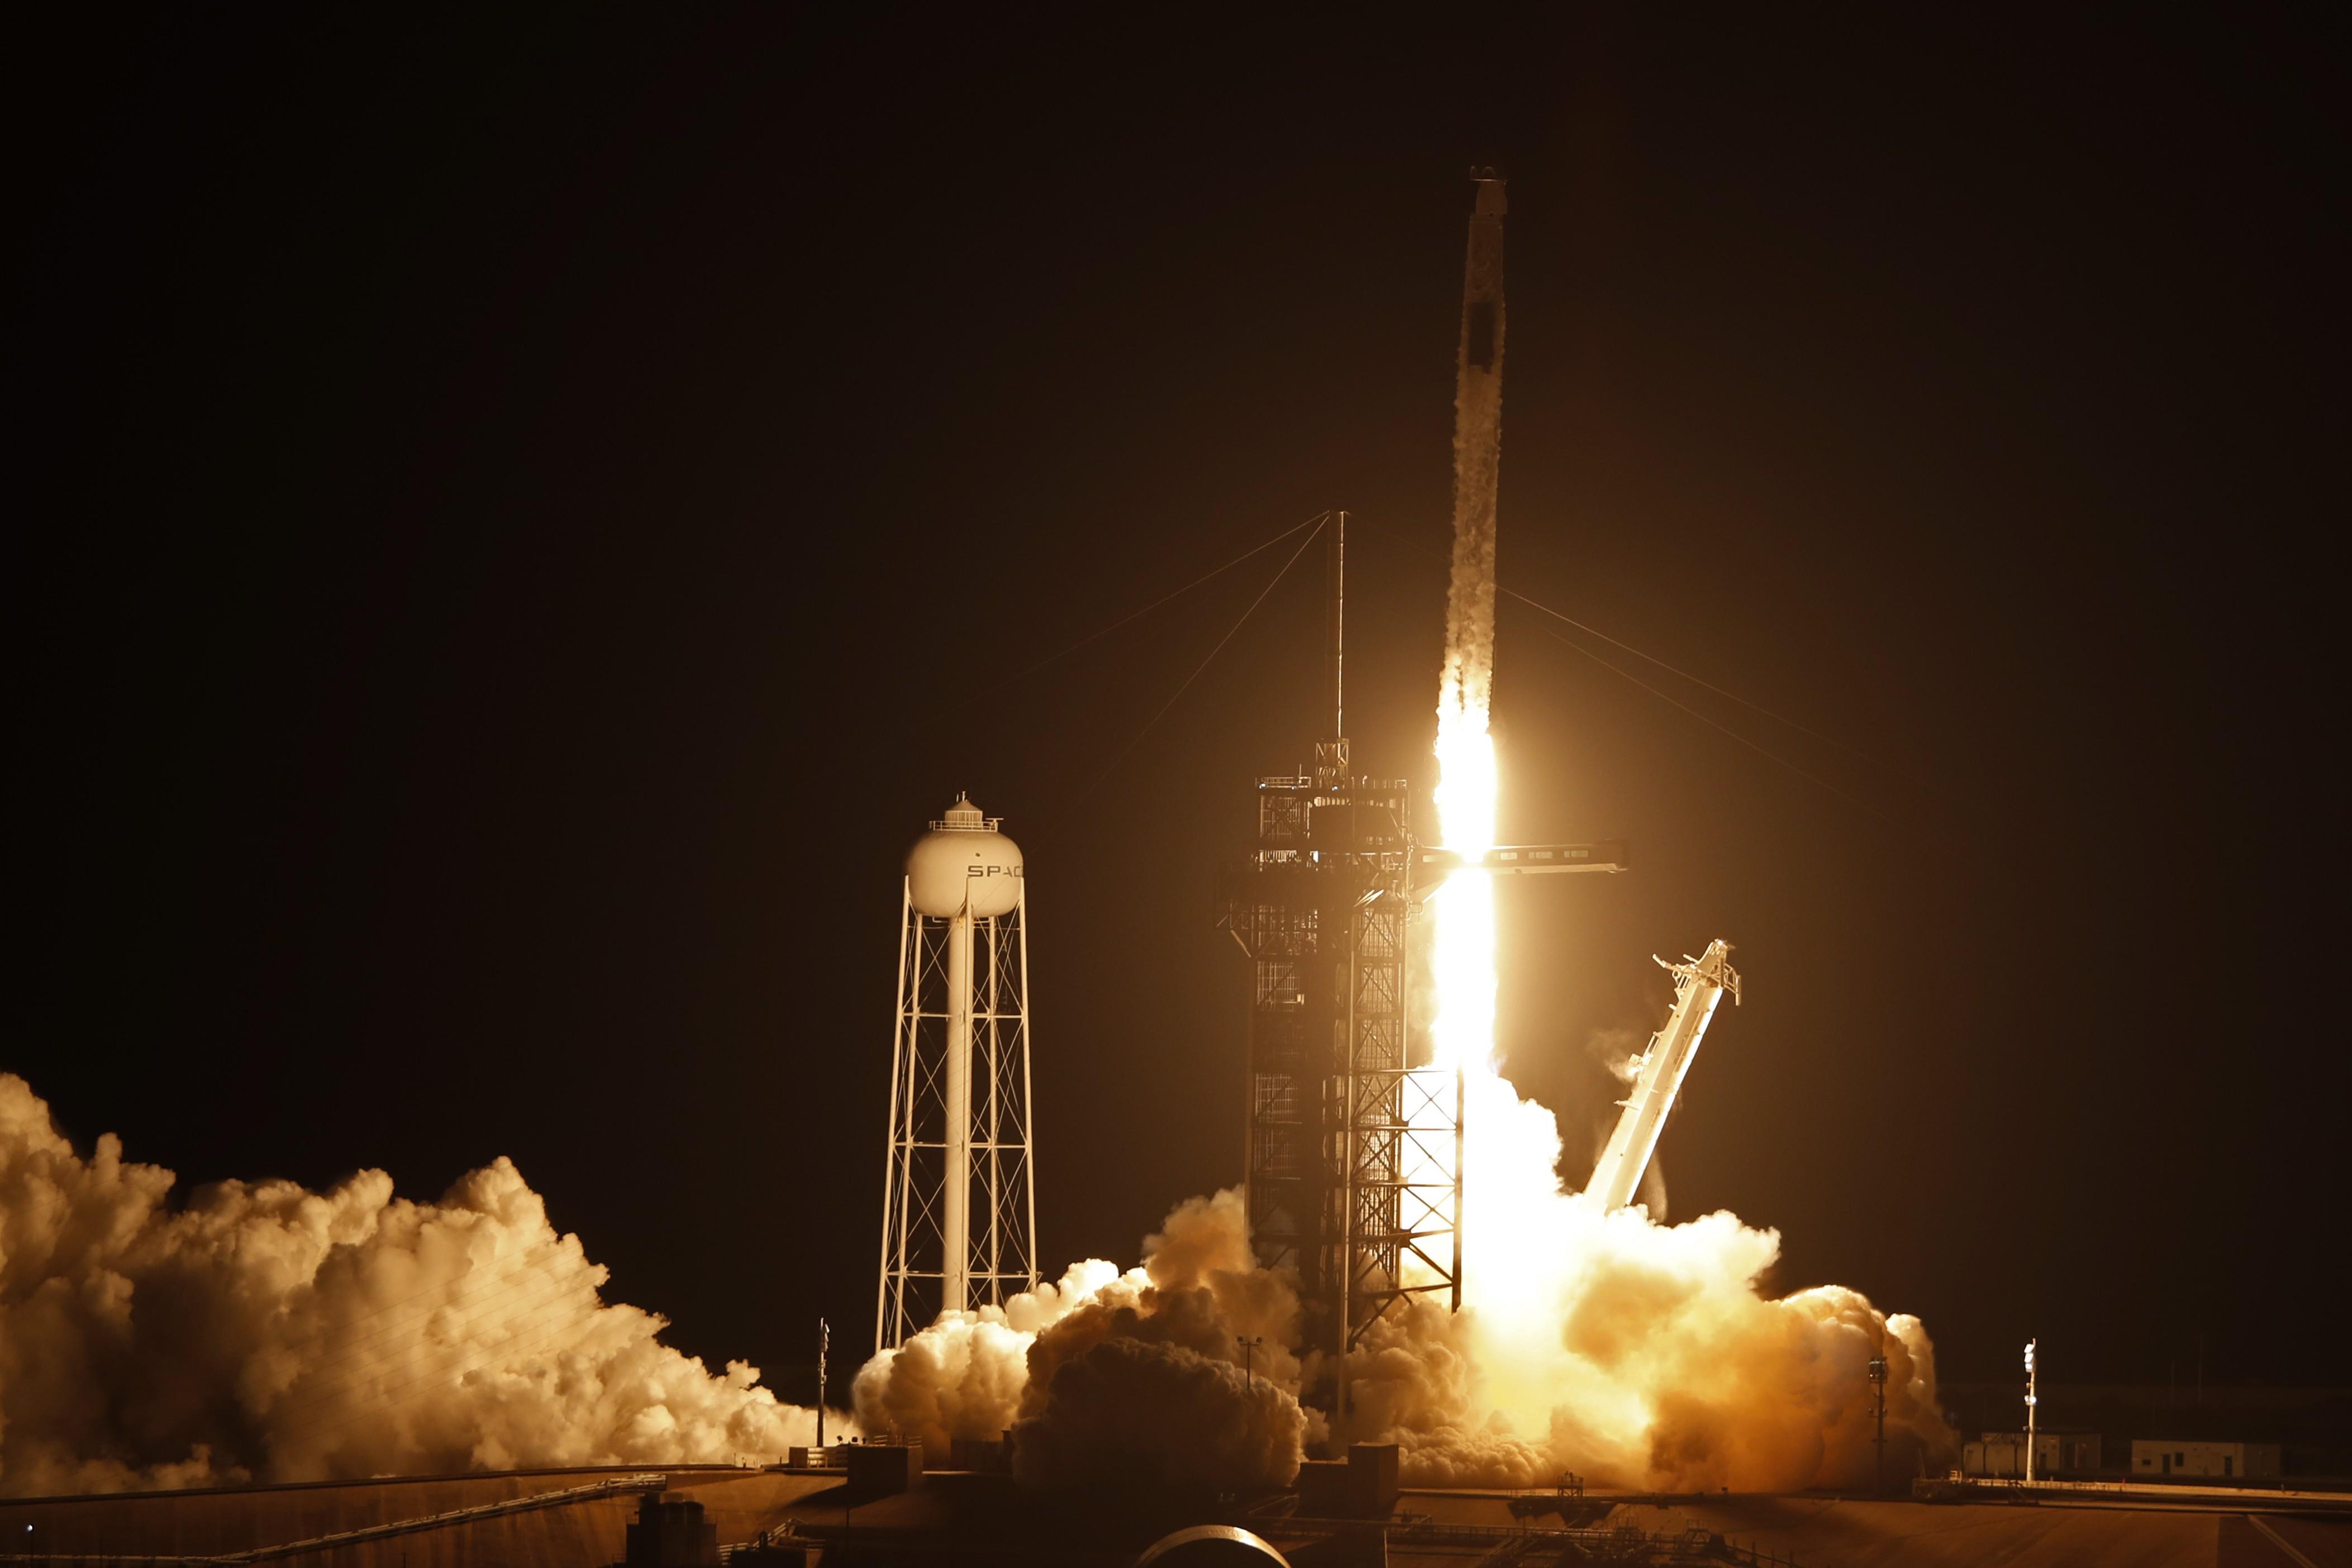 Voo orbital x suborbital: entenda as diferenças da viagem da SpaceX para as de Bezos e Branson